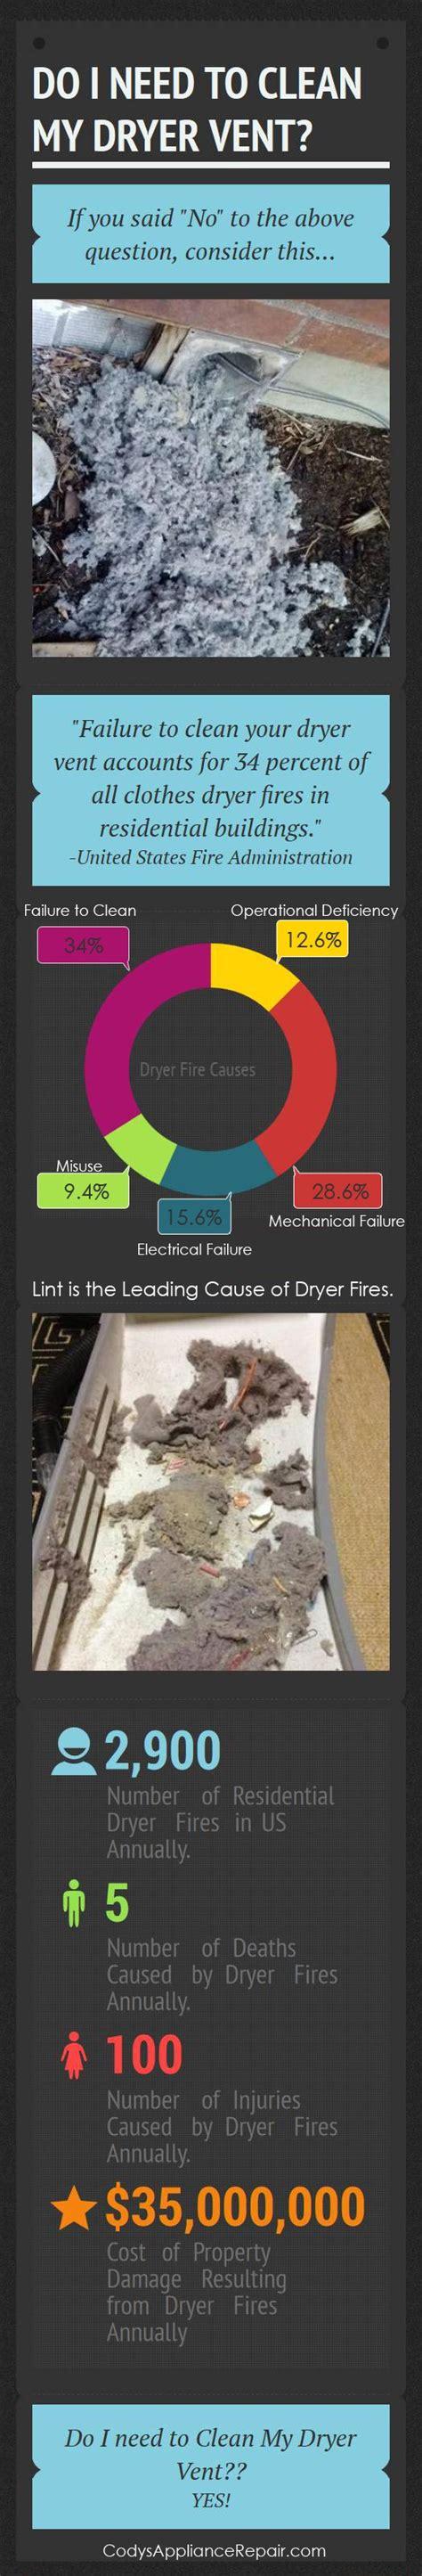 clean  dryer vent tips  codys appliance repair